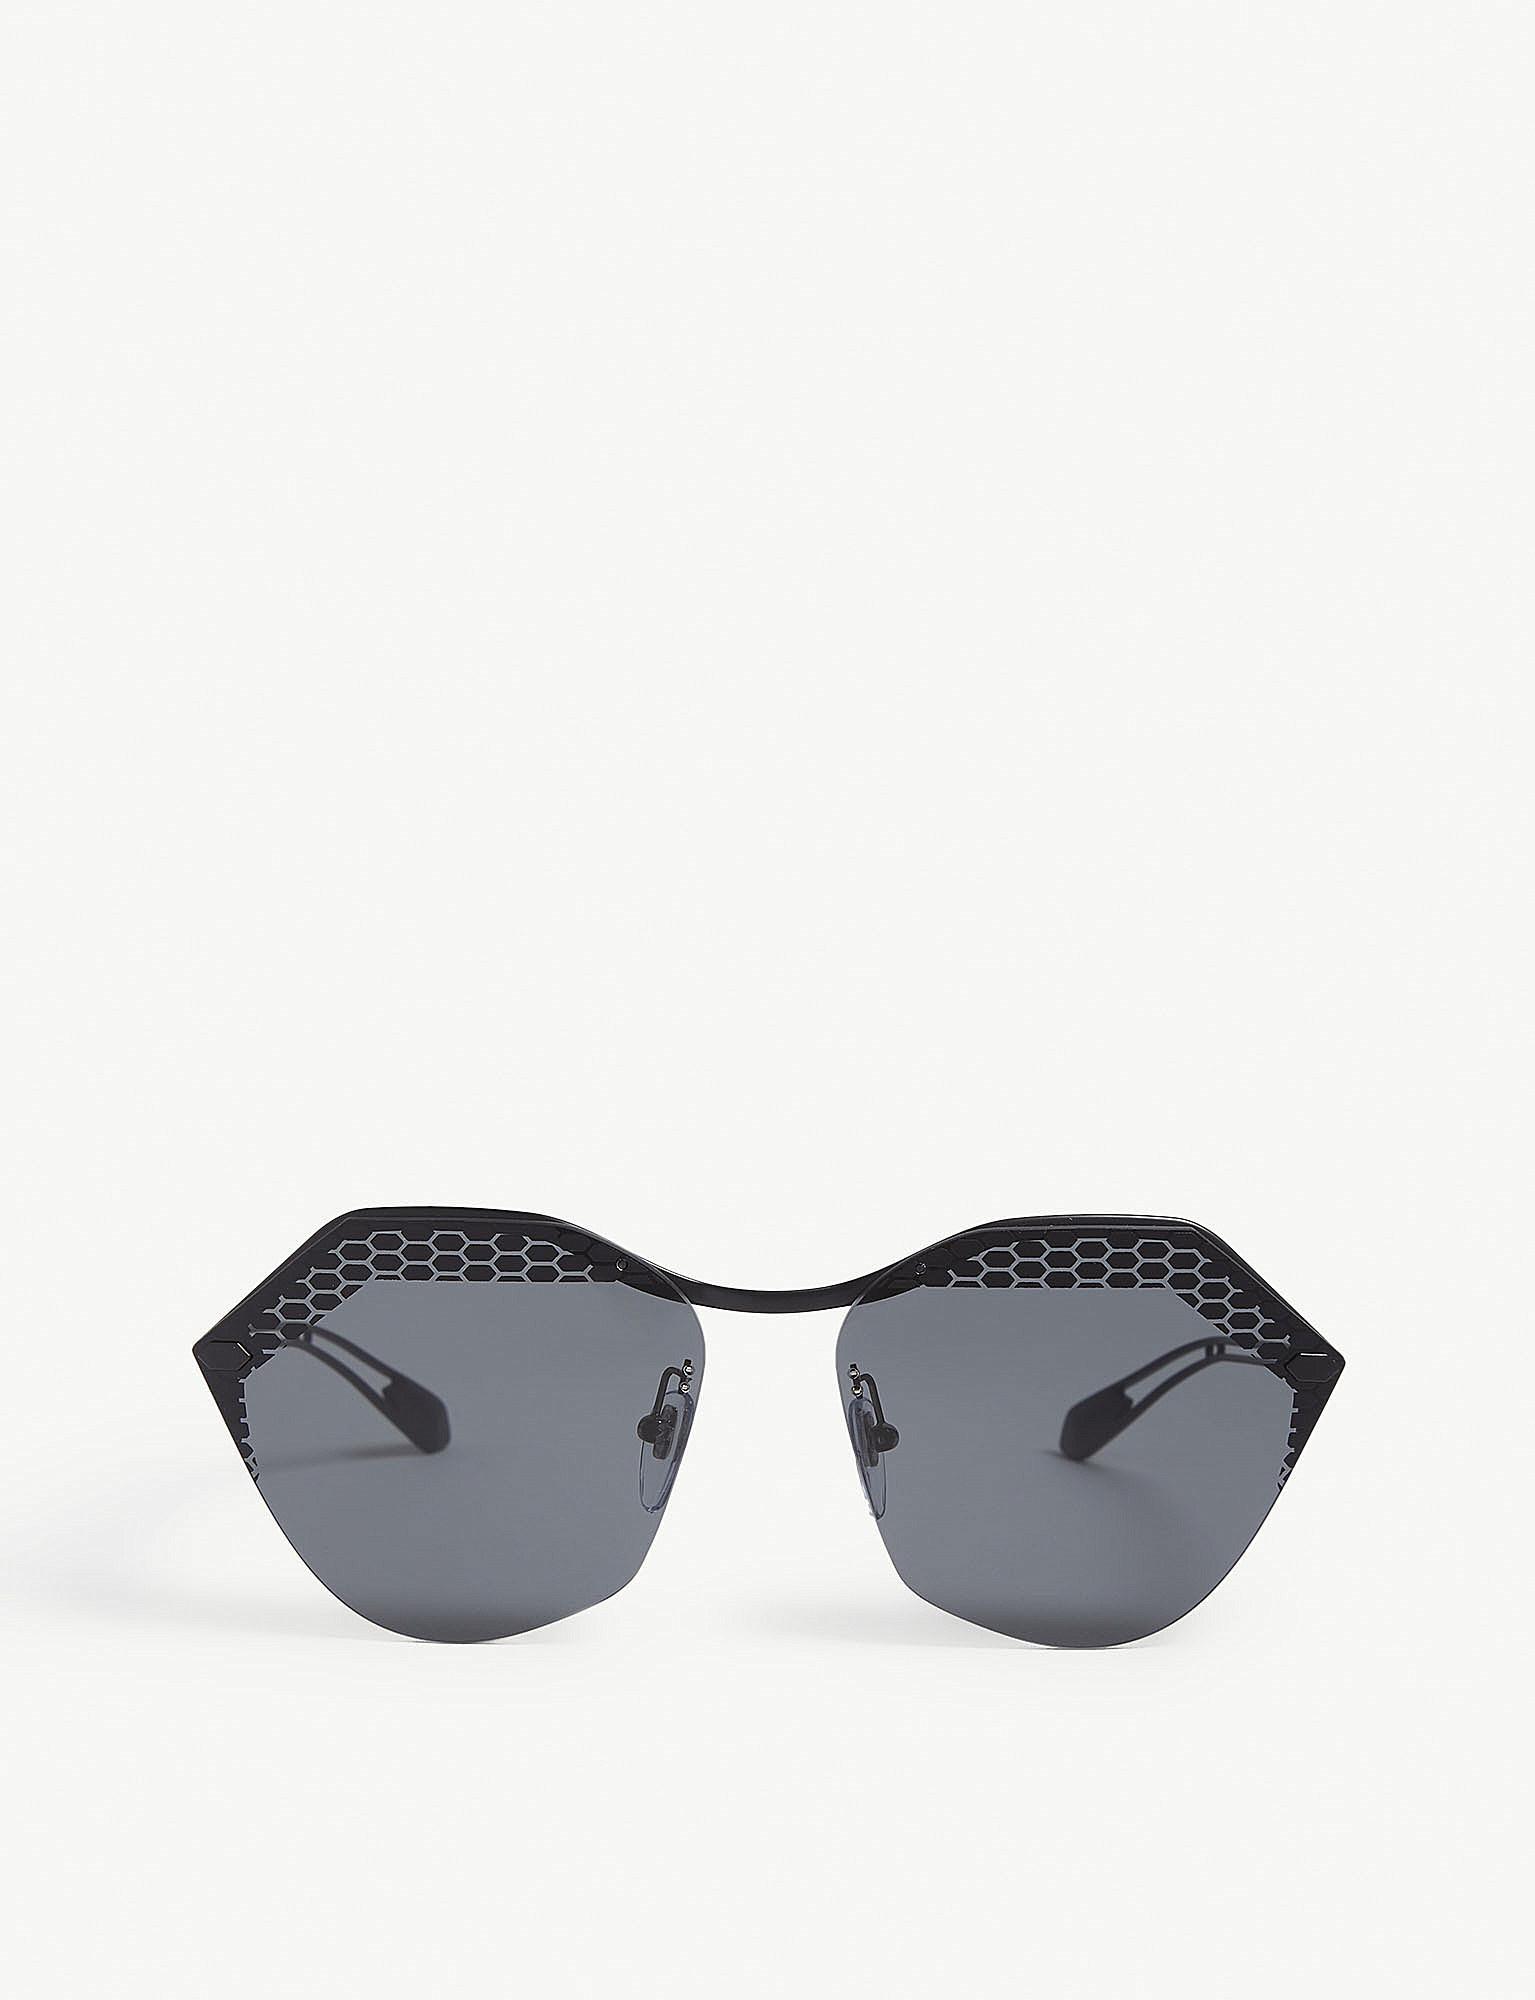 56dc7cf133ae8 BVLGARI Bv6109 Irregular-frame Sunglasses in Black - Lyst